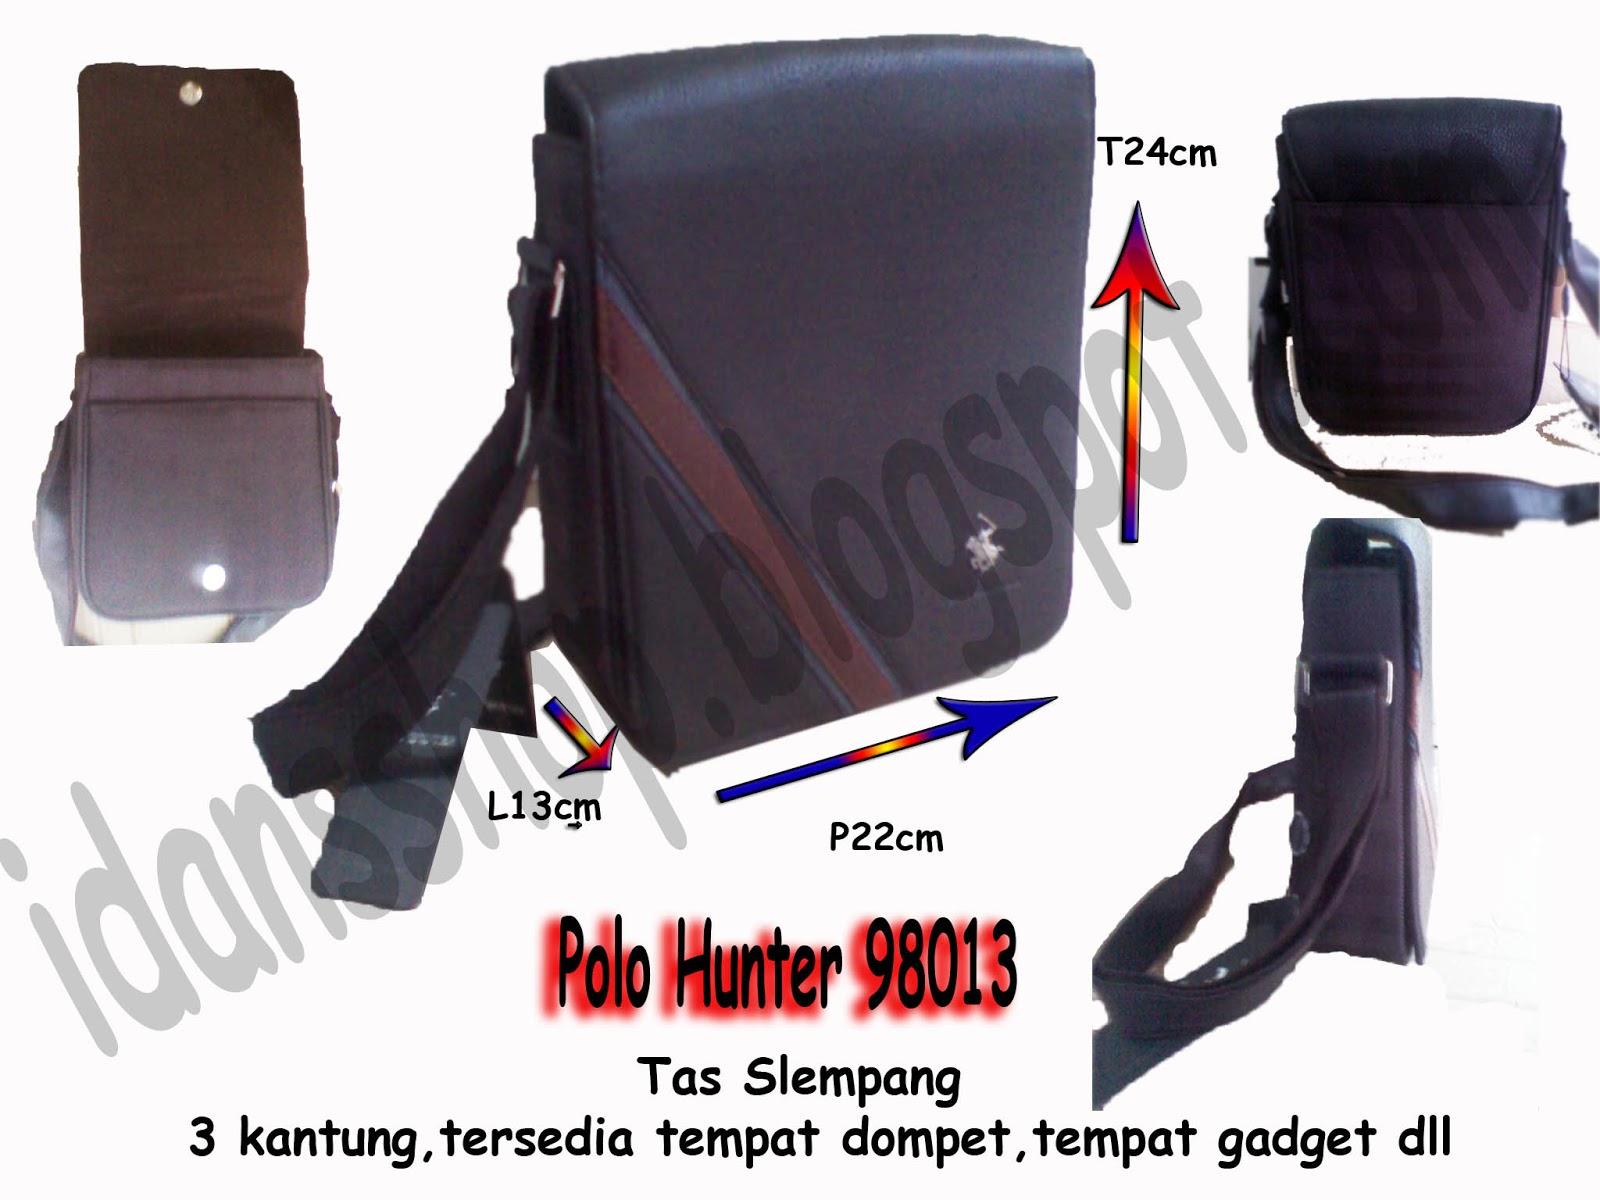 c7cca0c18450 Tas Slempang Polo Hunter 98013. RpSold. Polo Hunter 98013 Original Obral  Harga Nett Rp 95.000 plus ongkir untuk wilayah jakarta